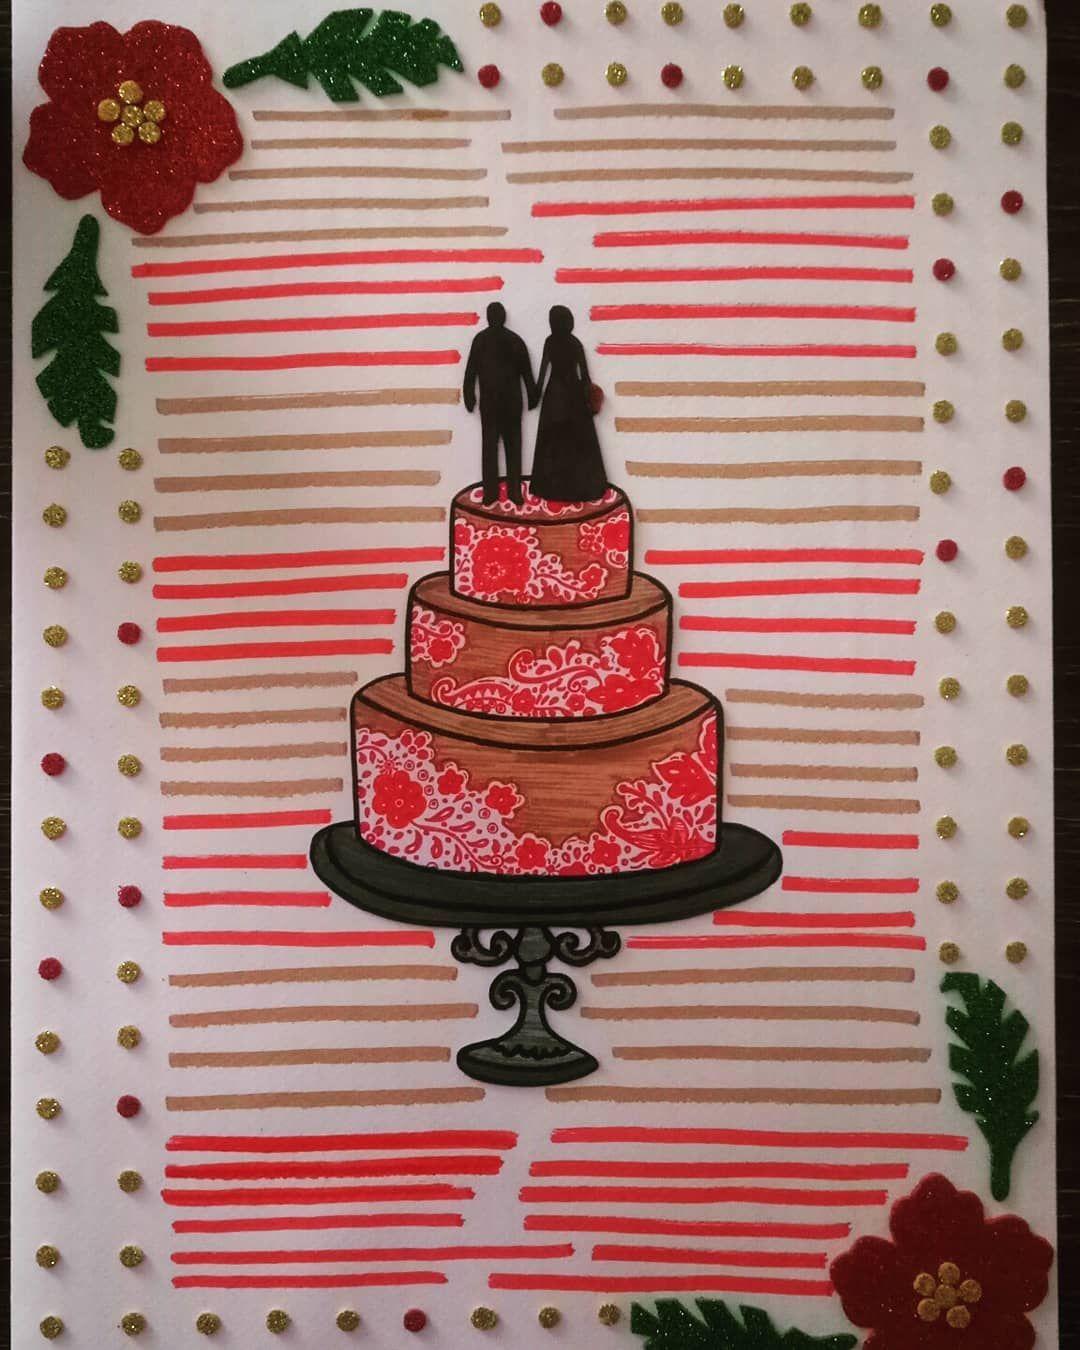 CONGRATULATIONS ON YOUR BIG DAY  A handmade wedding card.  @acrafts92